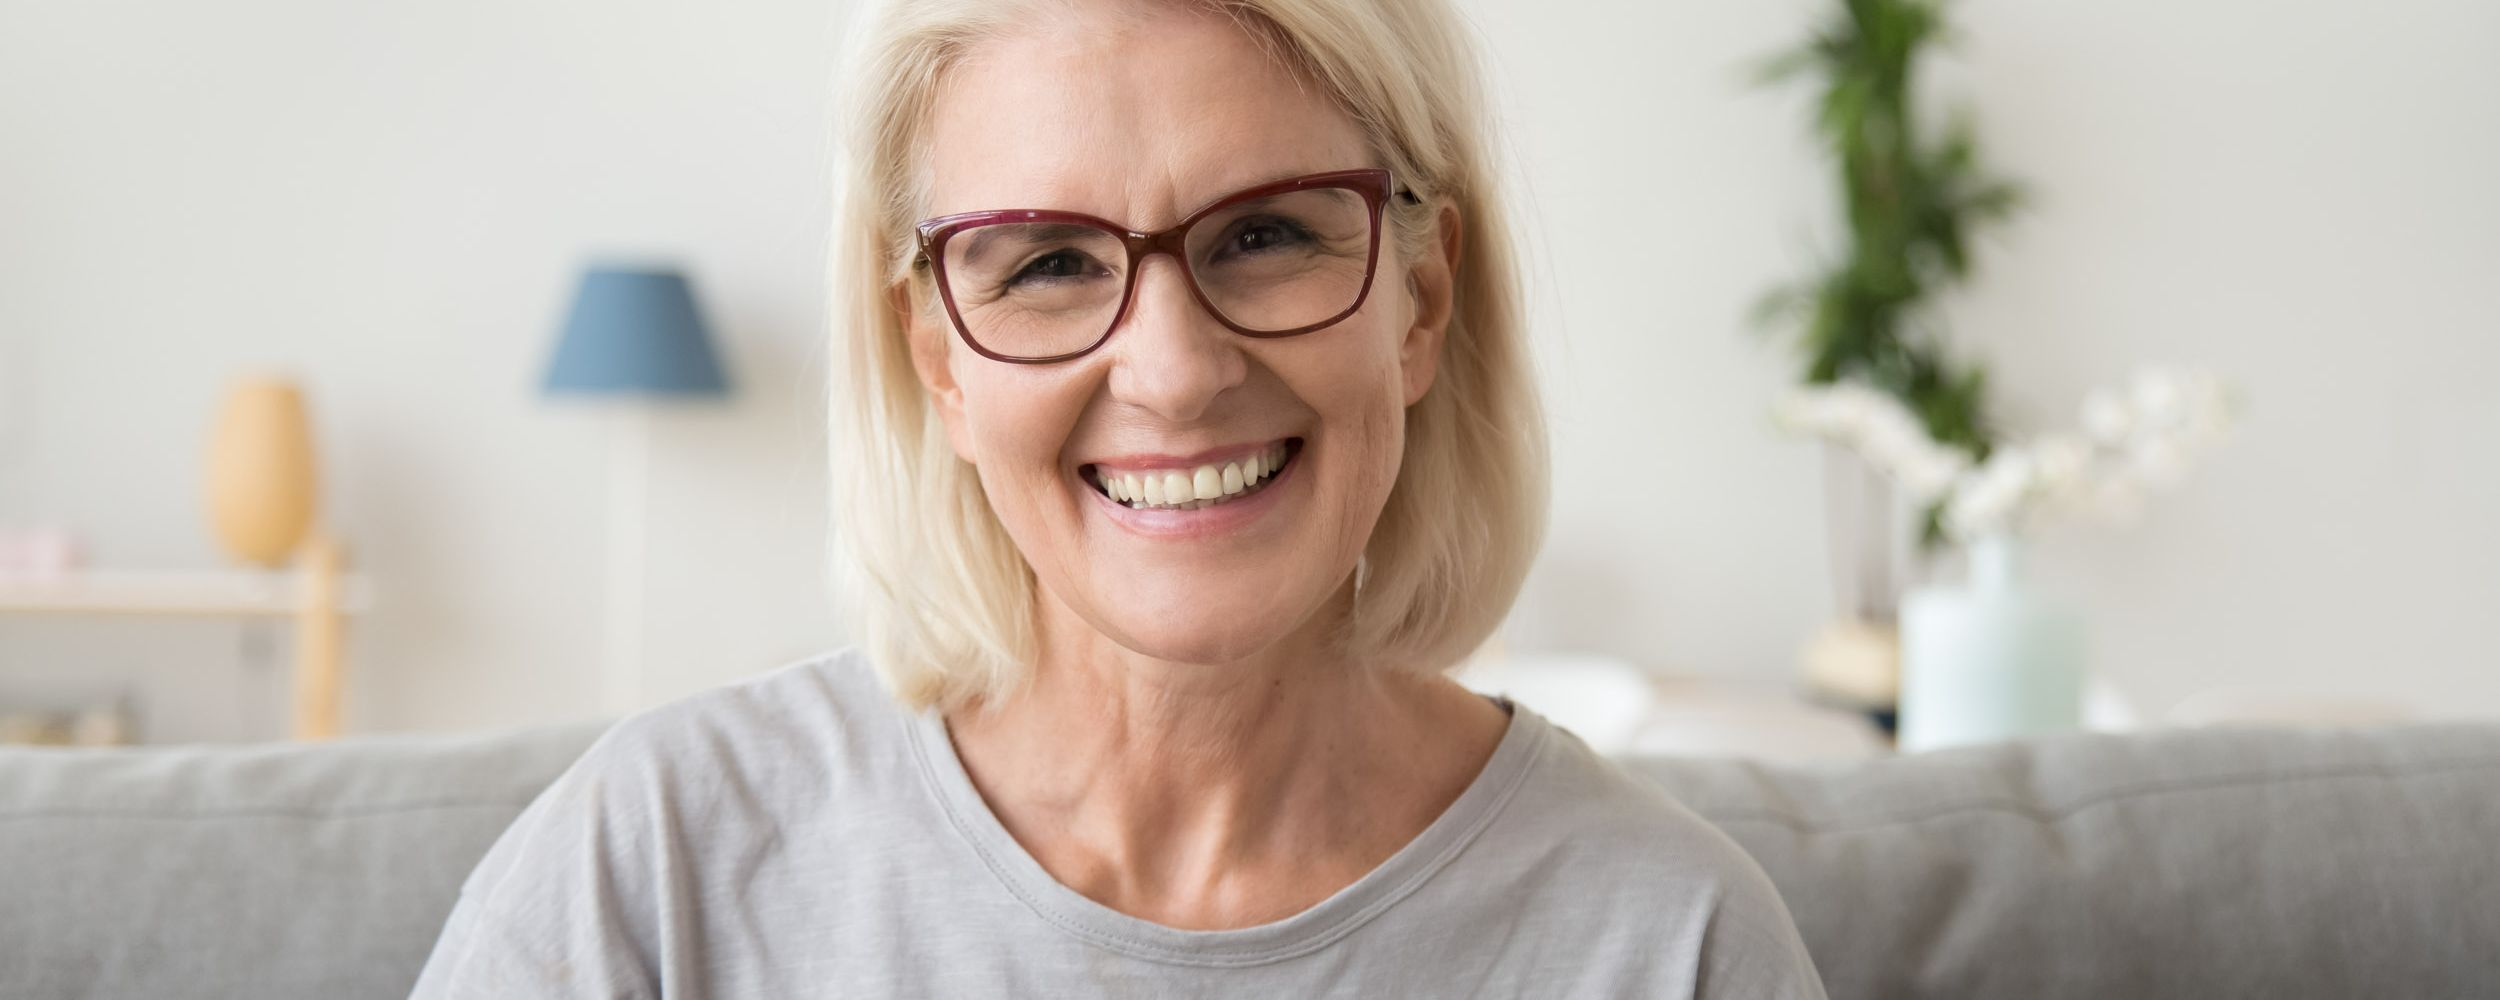 Clare's Facial Aesthetics treatment